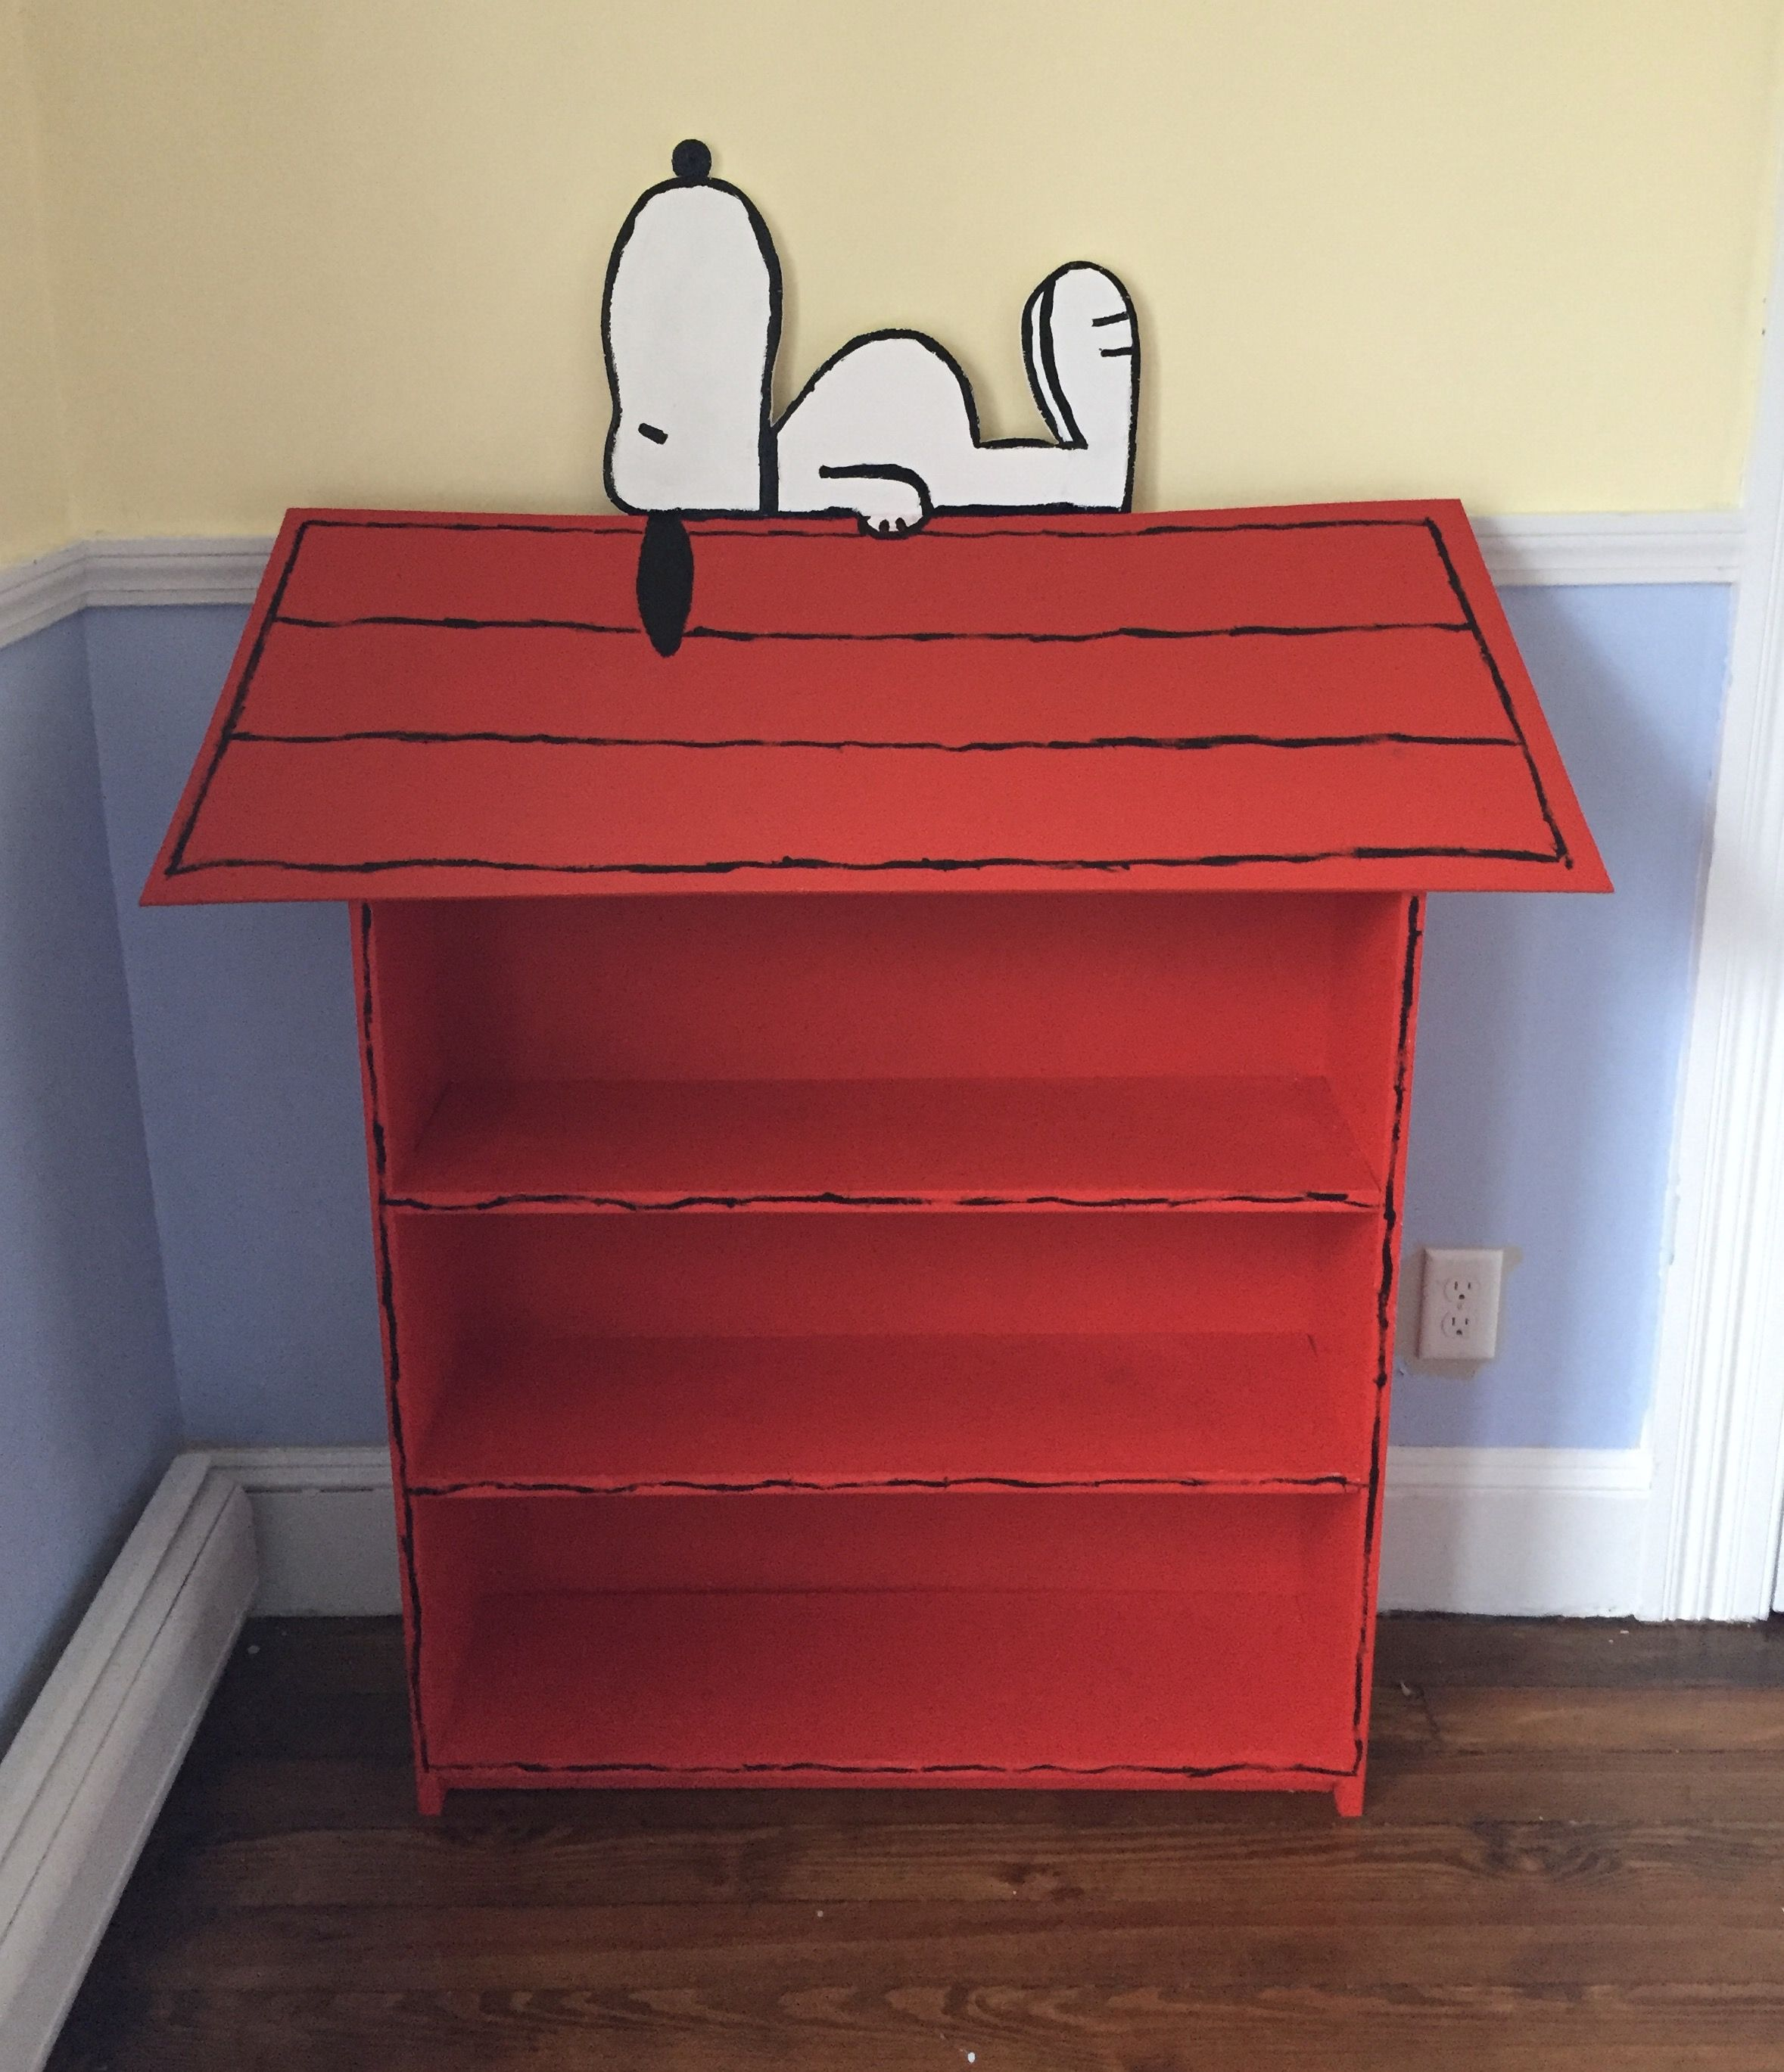 diy snoopy doghouse bookcase for snoopy nursery lvc diy projects